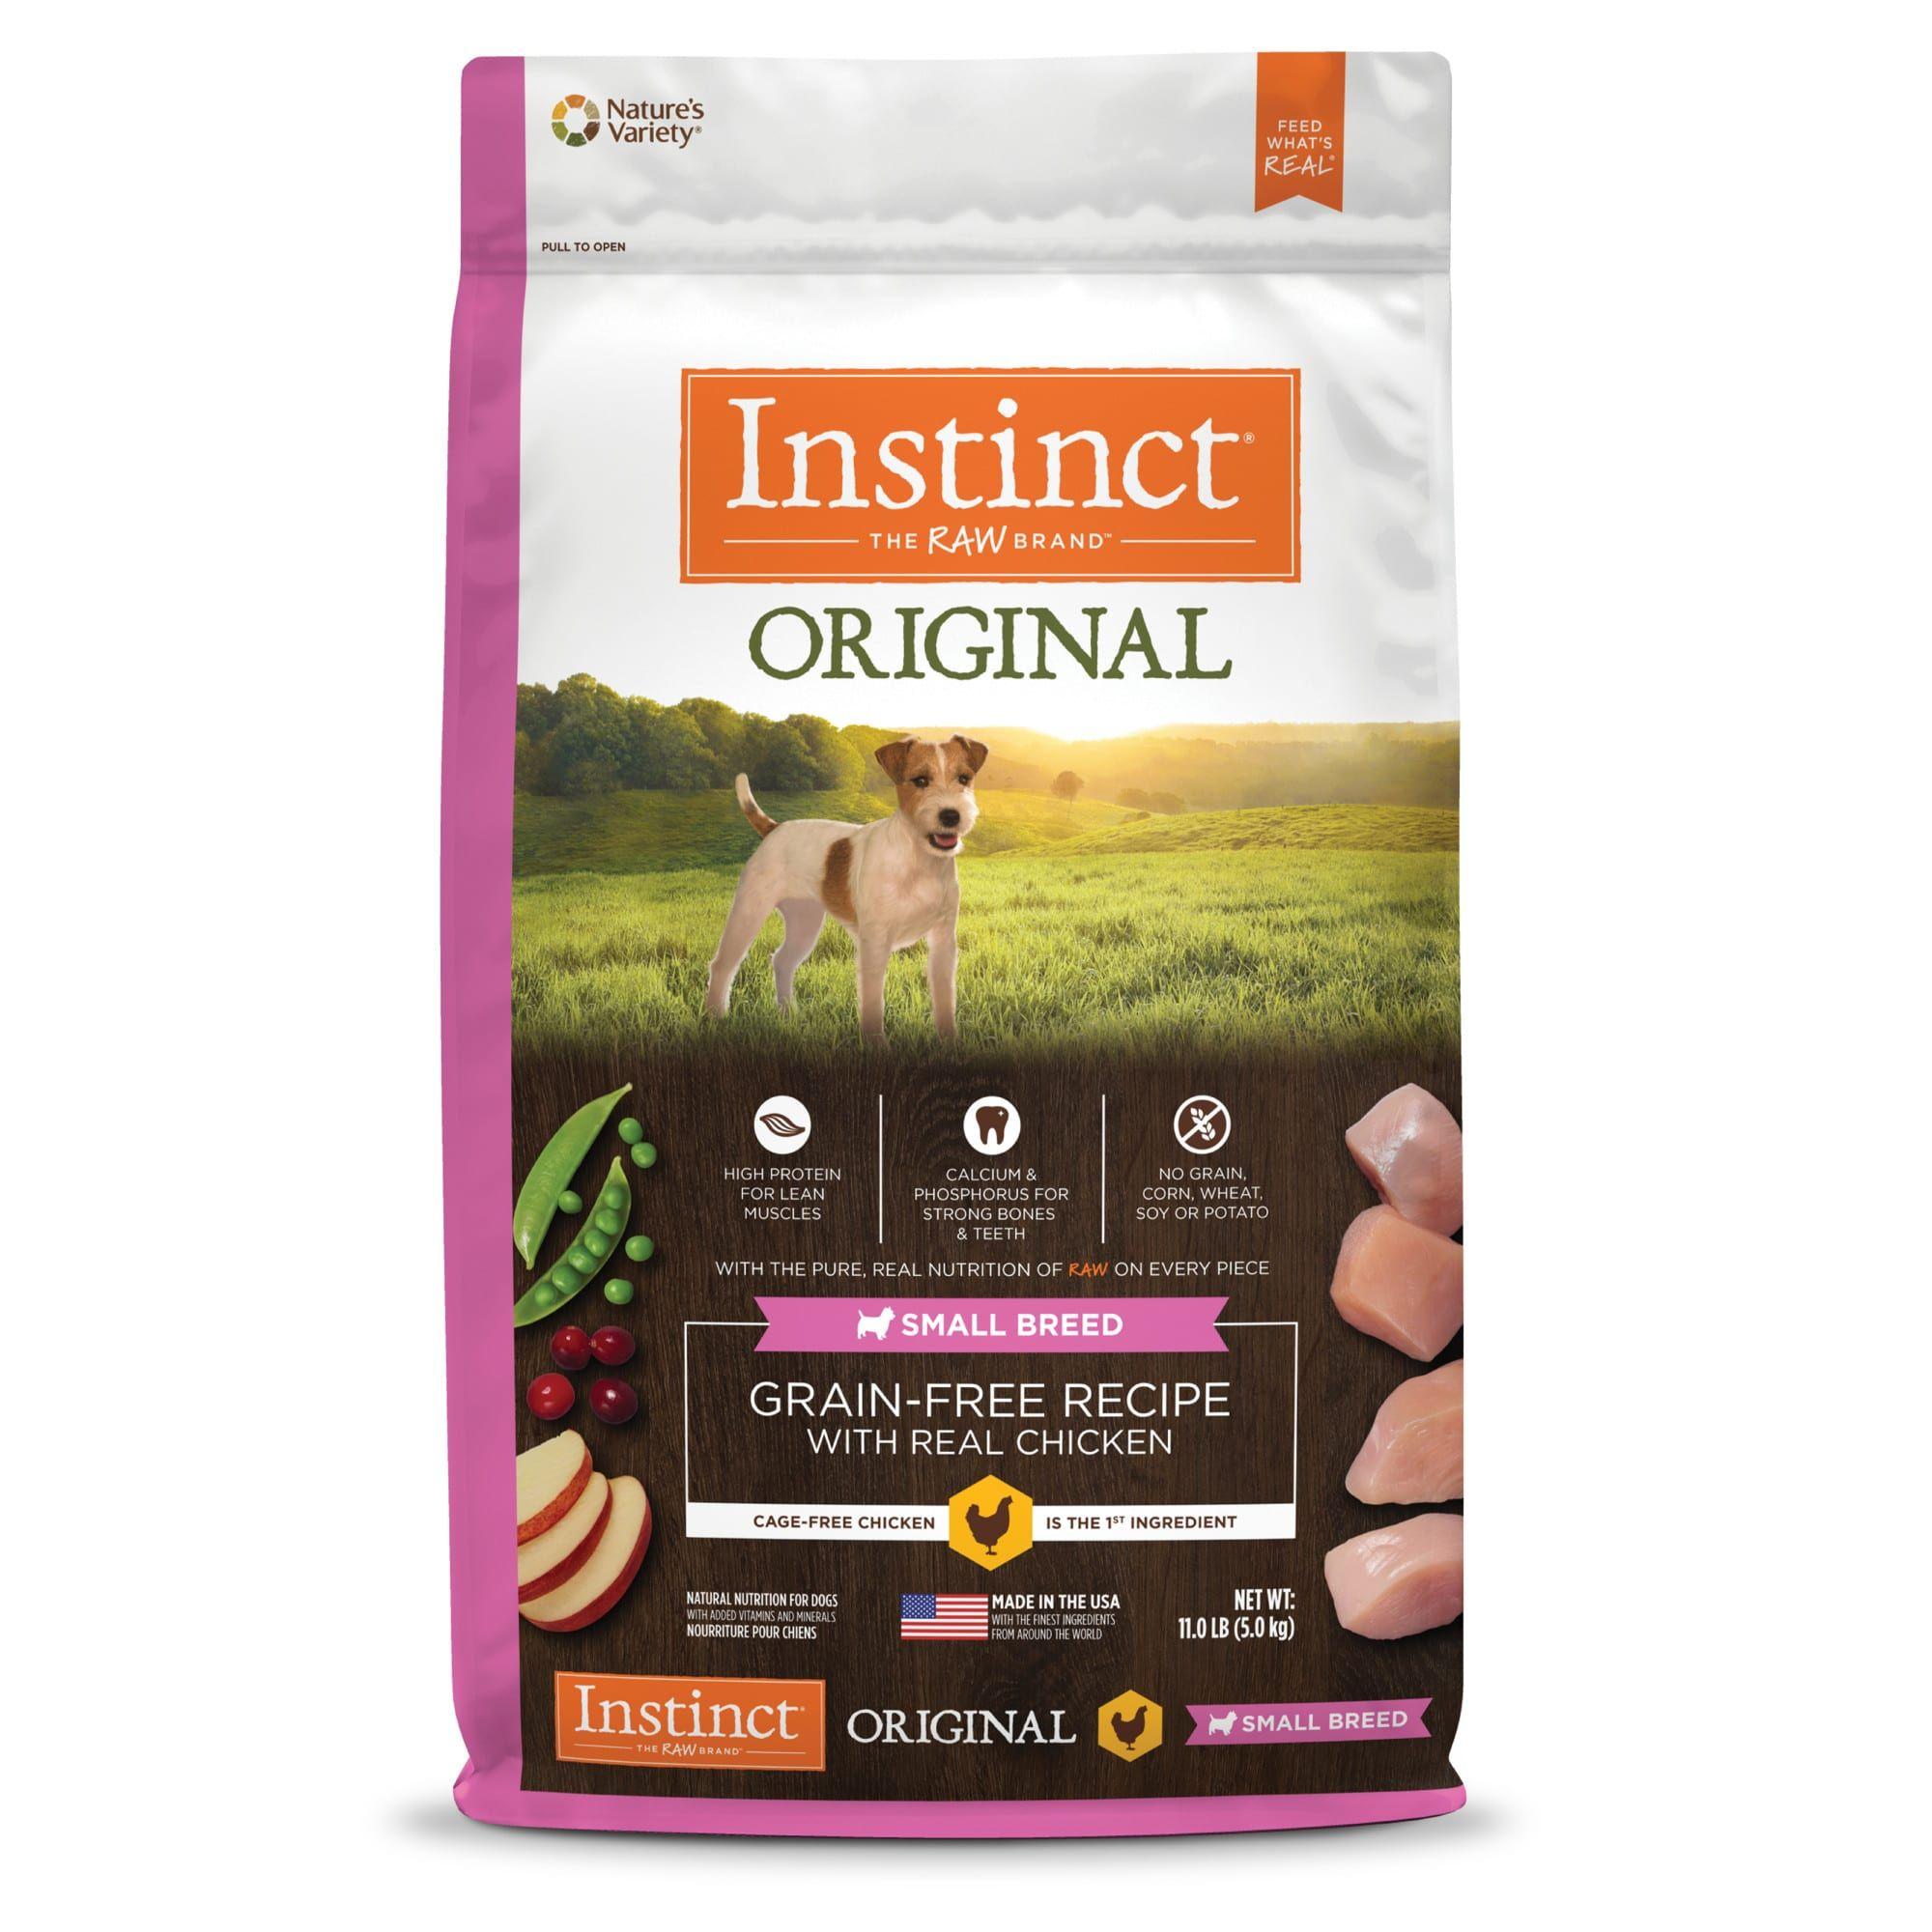 Instinct Original Small Breed GrainFree Recipe with Real